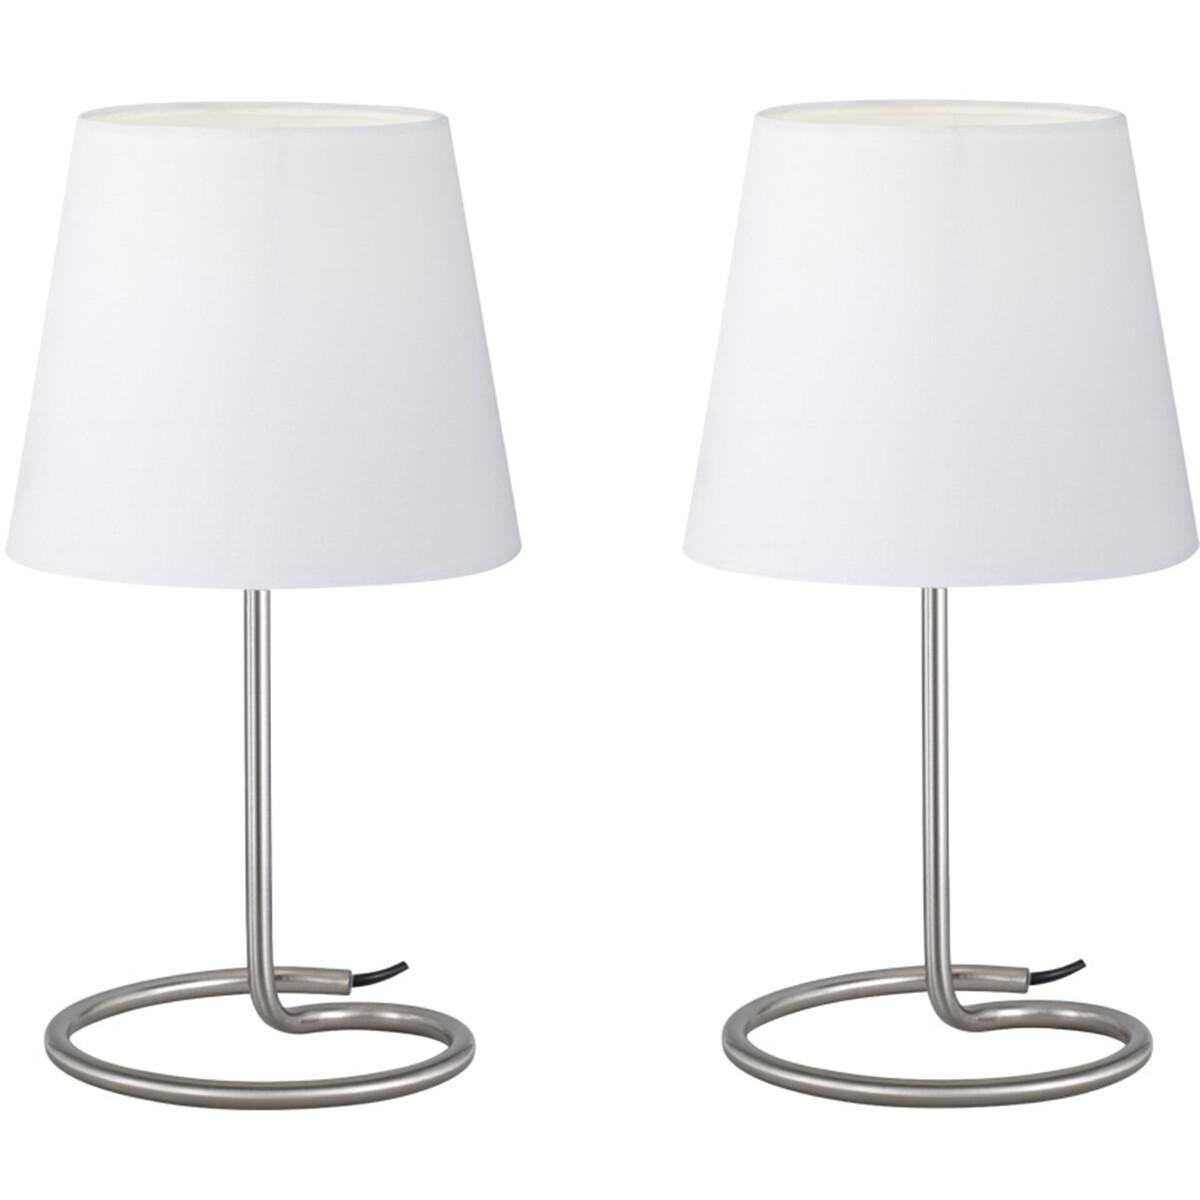 LED Tafellamp 2 Pack - Tafelverlichting - Trion Twinko - E14 Fitting - Rond - Mat Nikkel - Aluminium